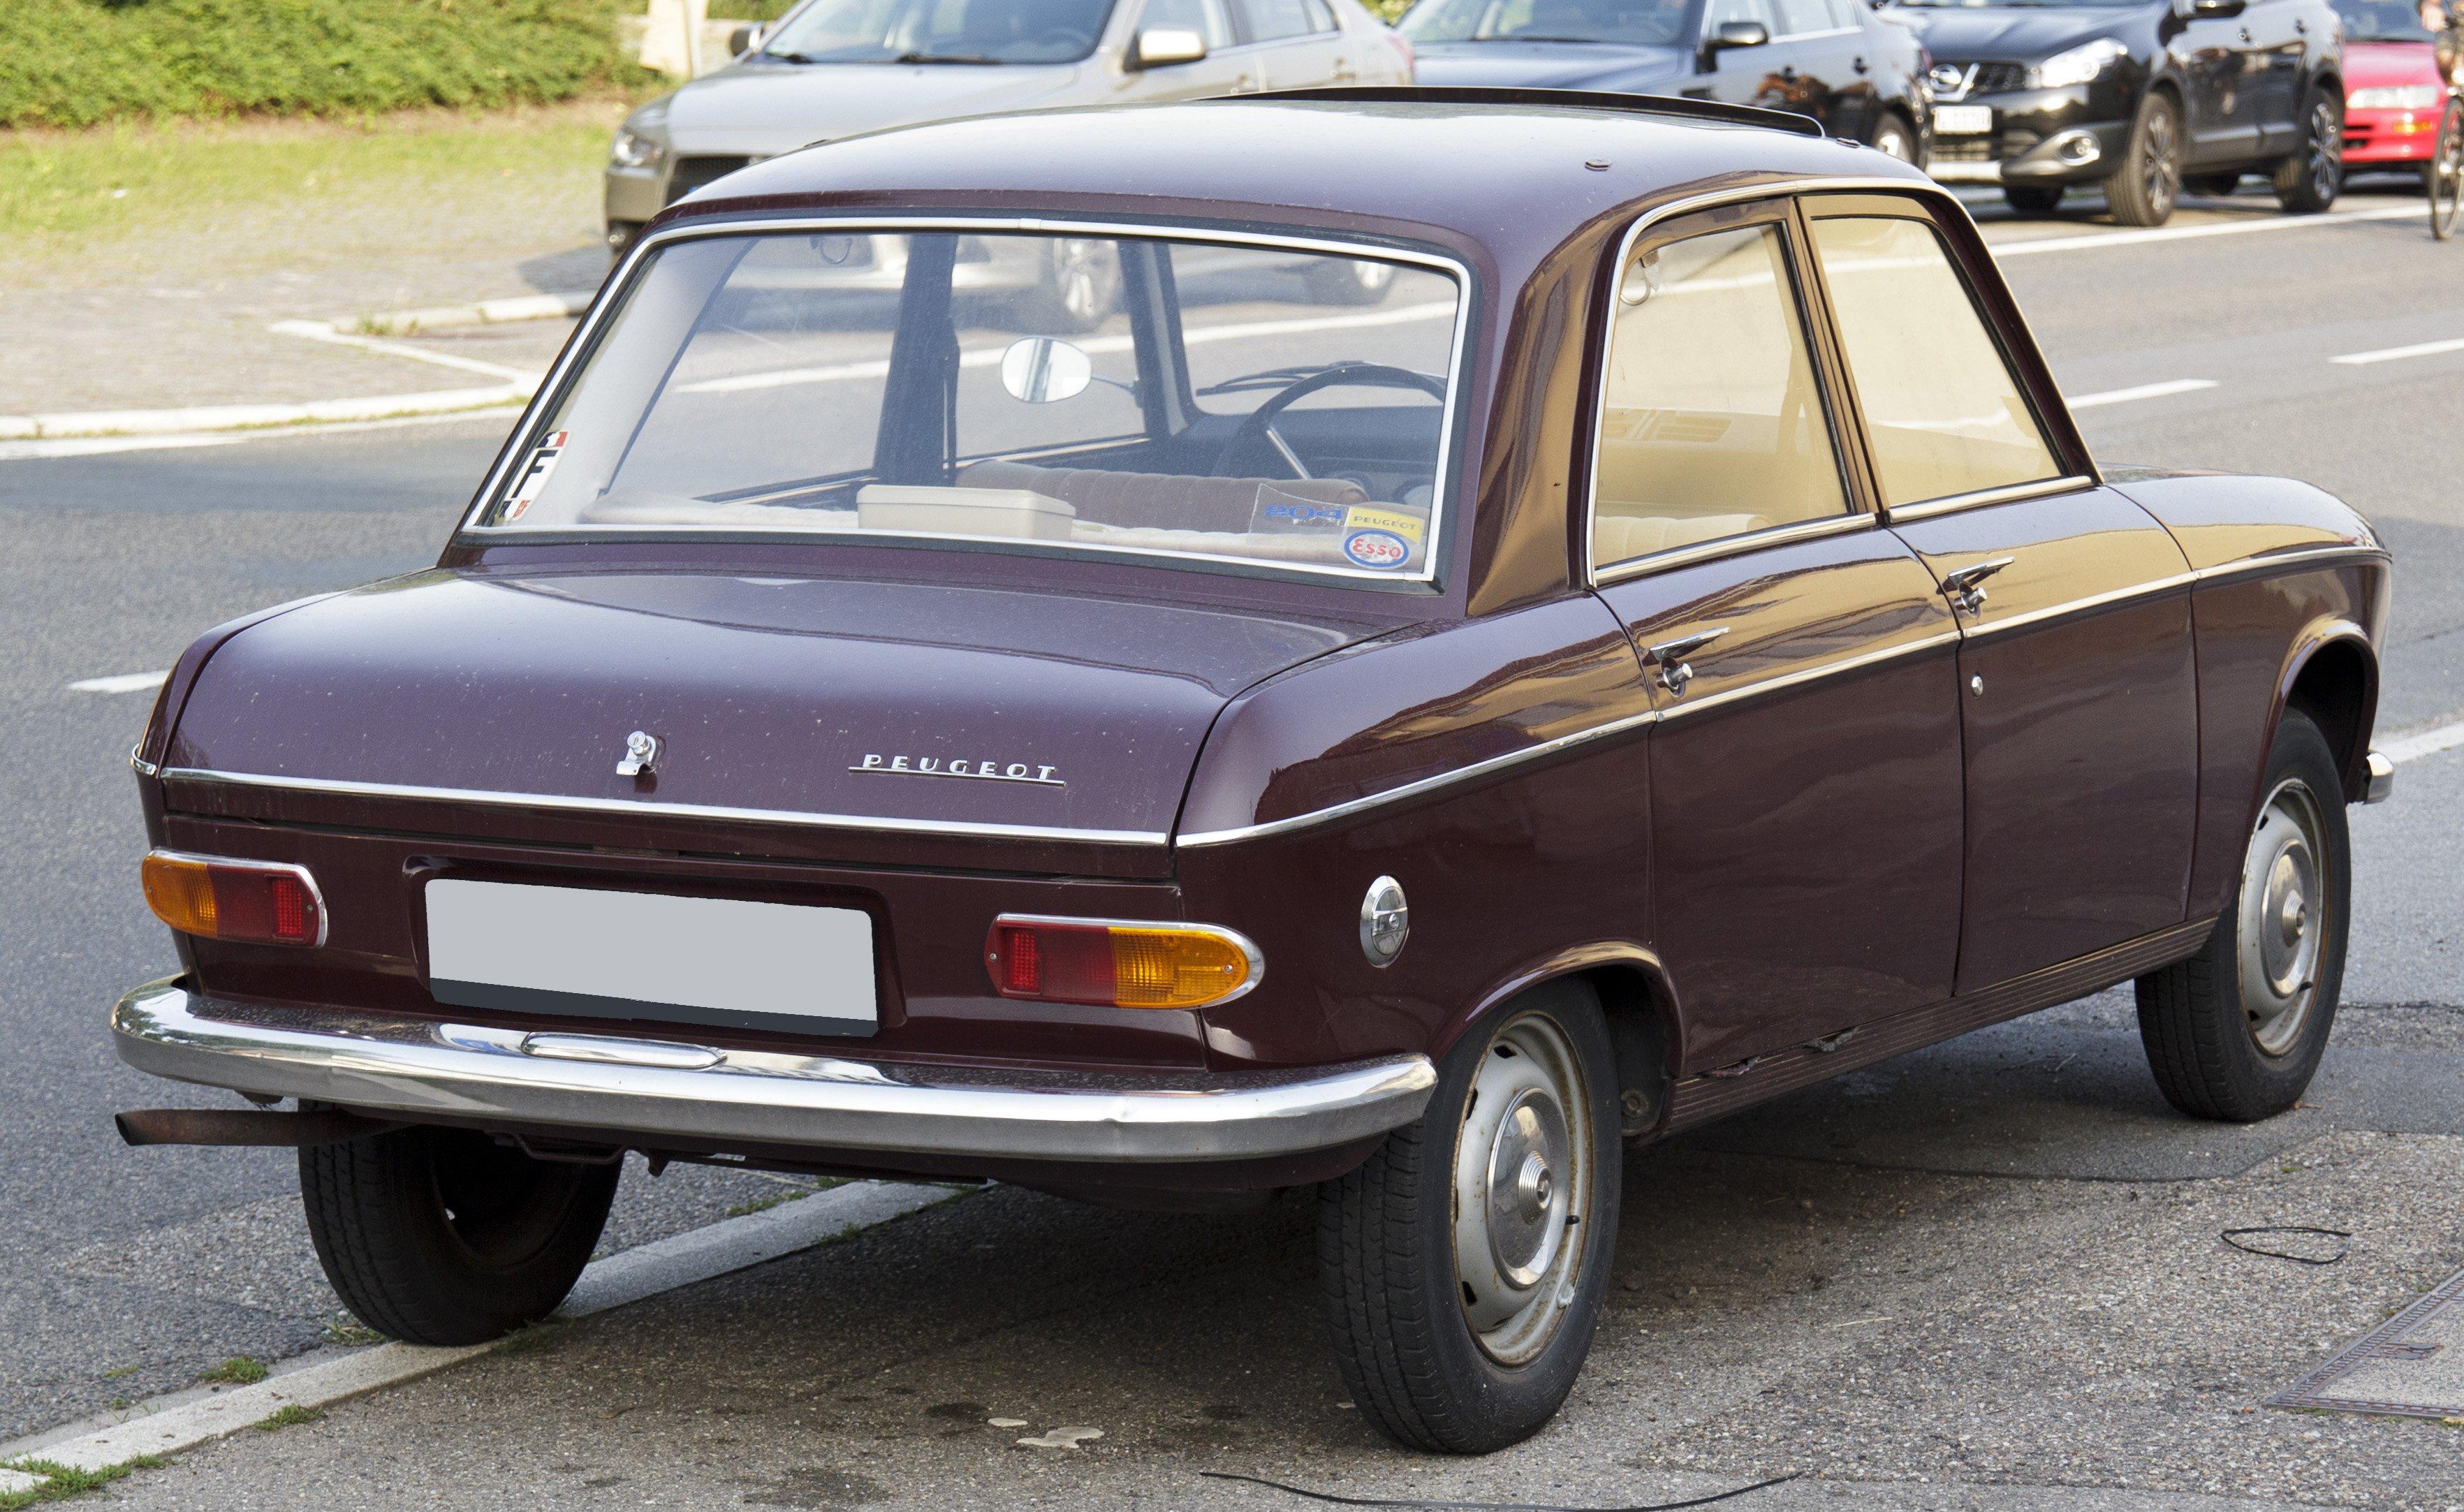 Peugeot 204 cars classic french sedan wallpaper | 3528x2165 | 597760 ...